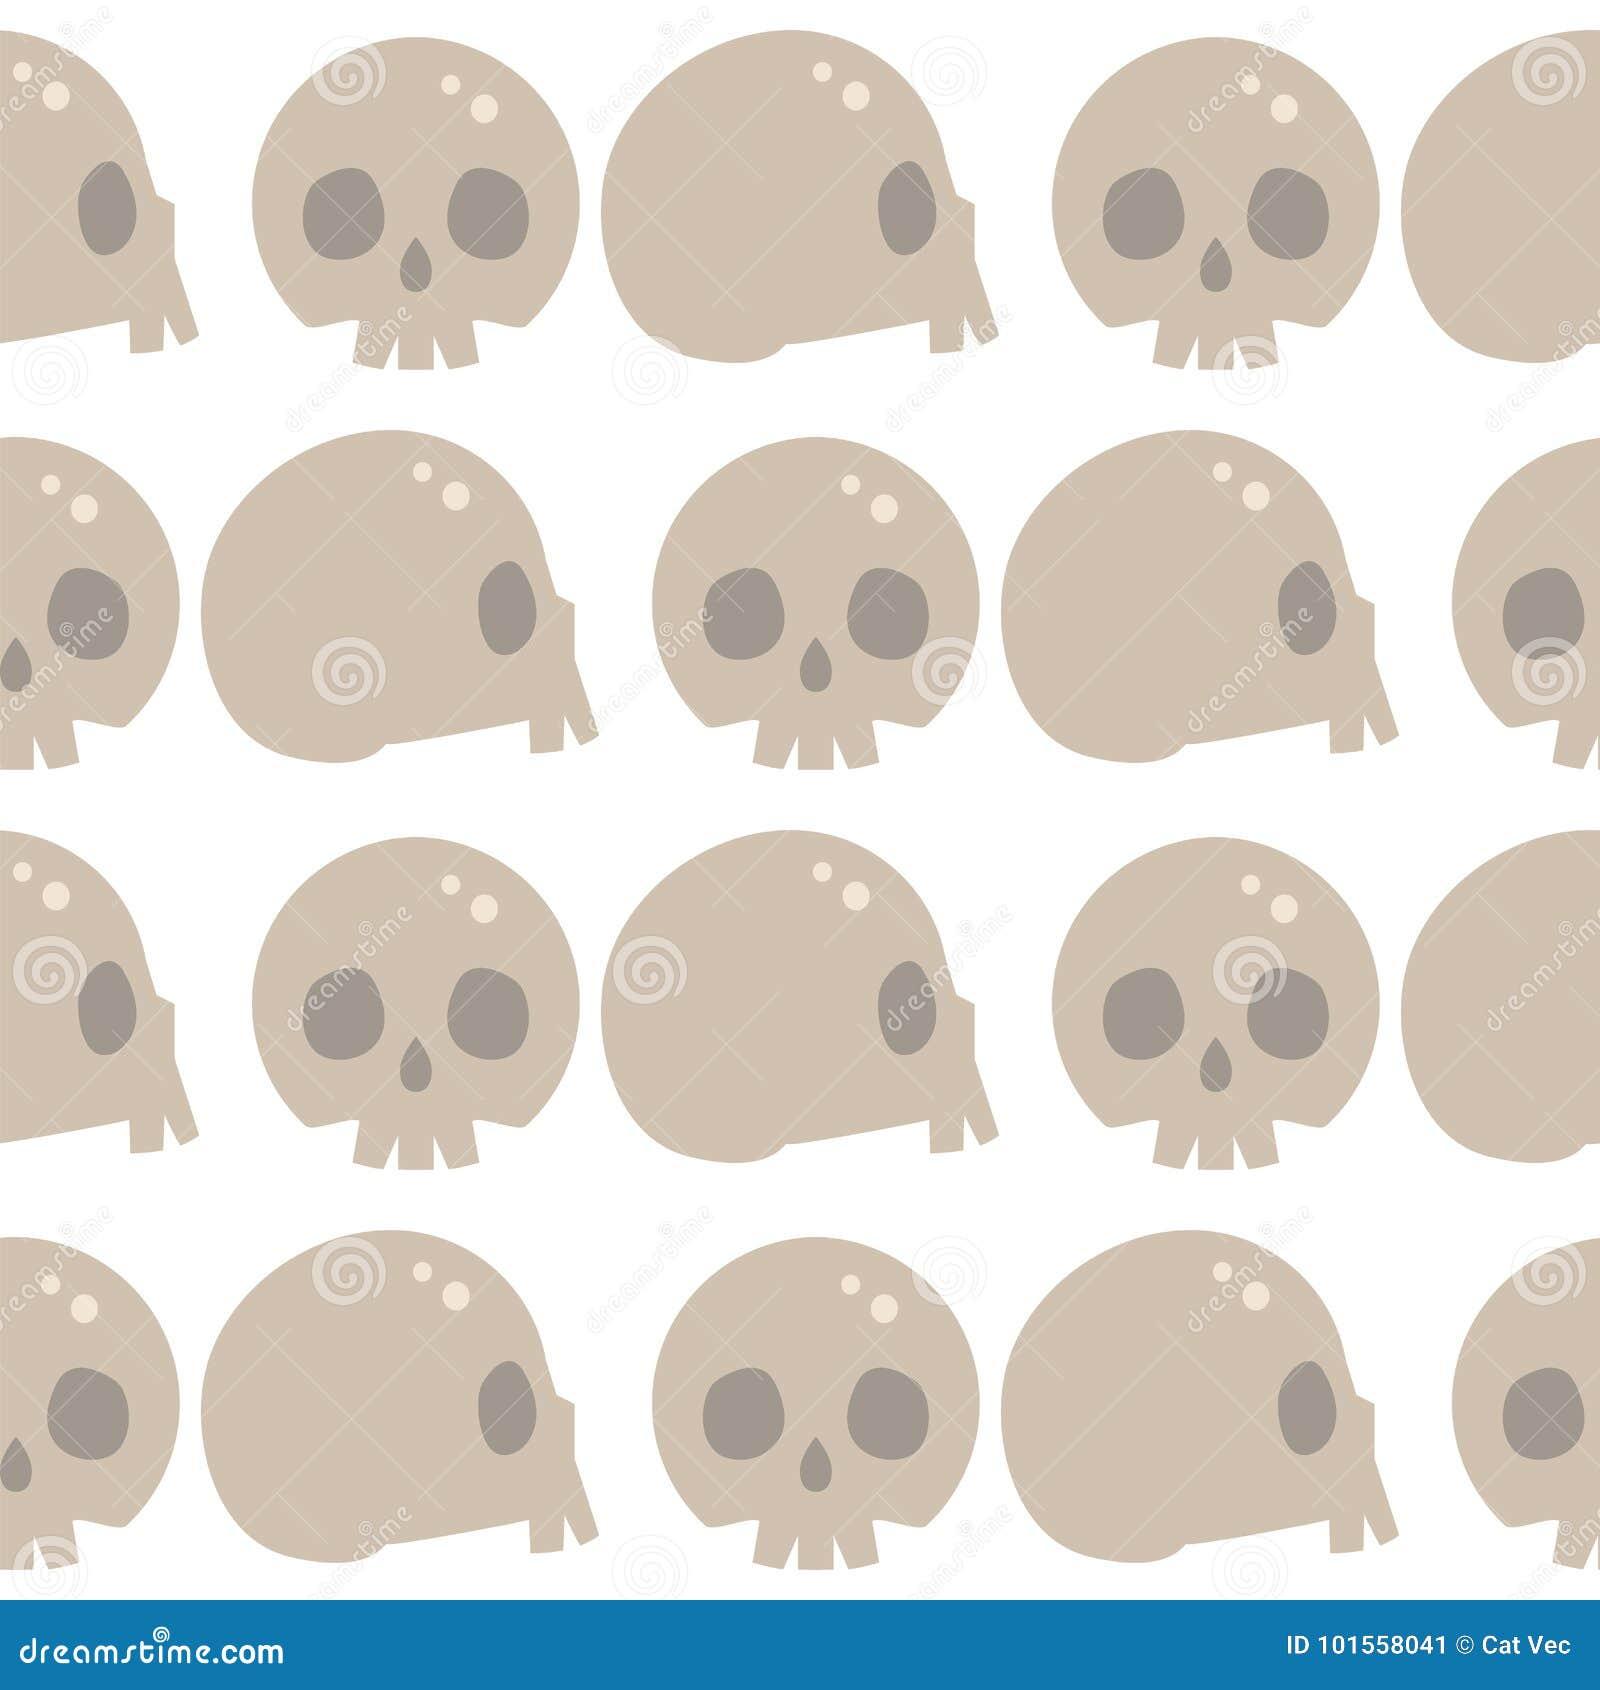 Style Skulls Faces Seamless Pattern Background Vector Illustration ...